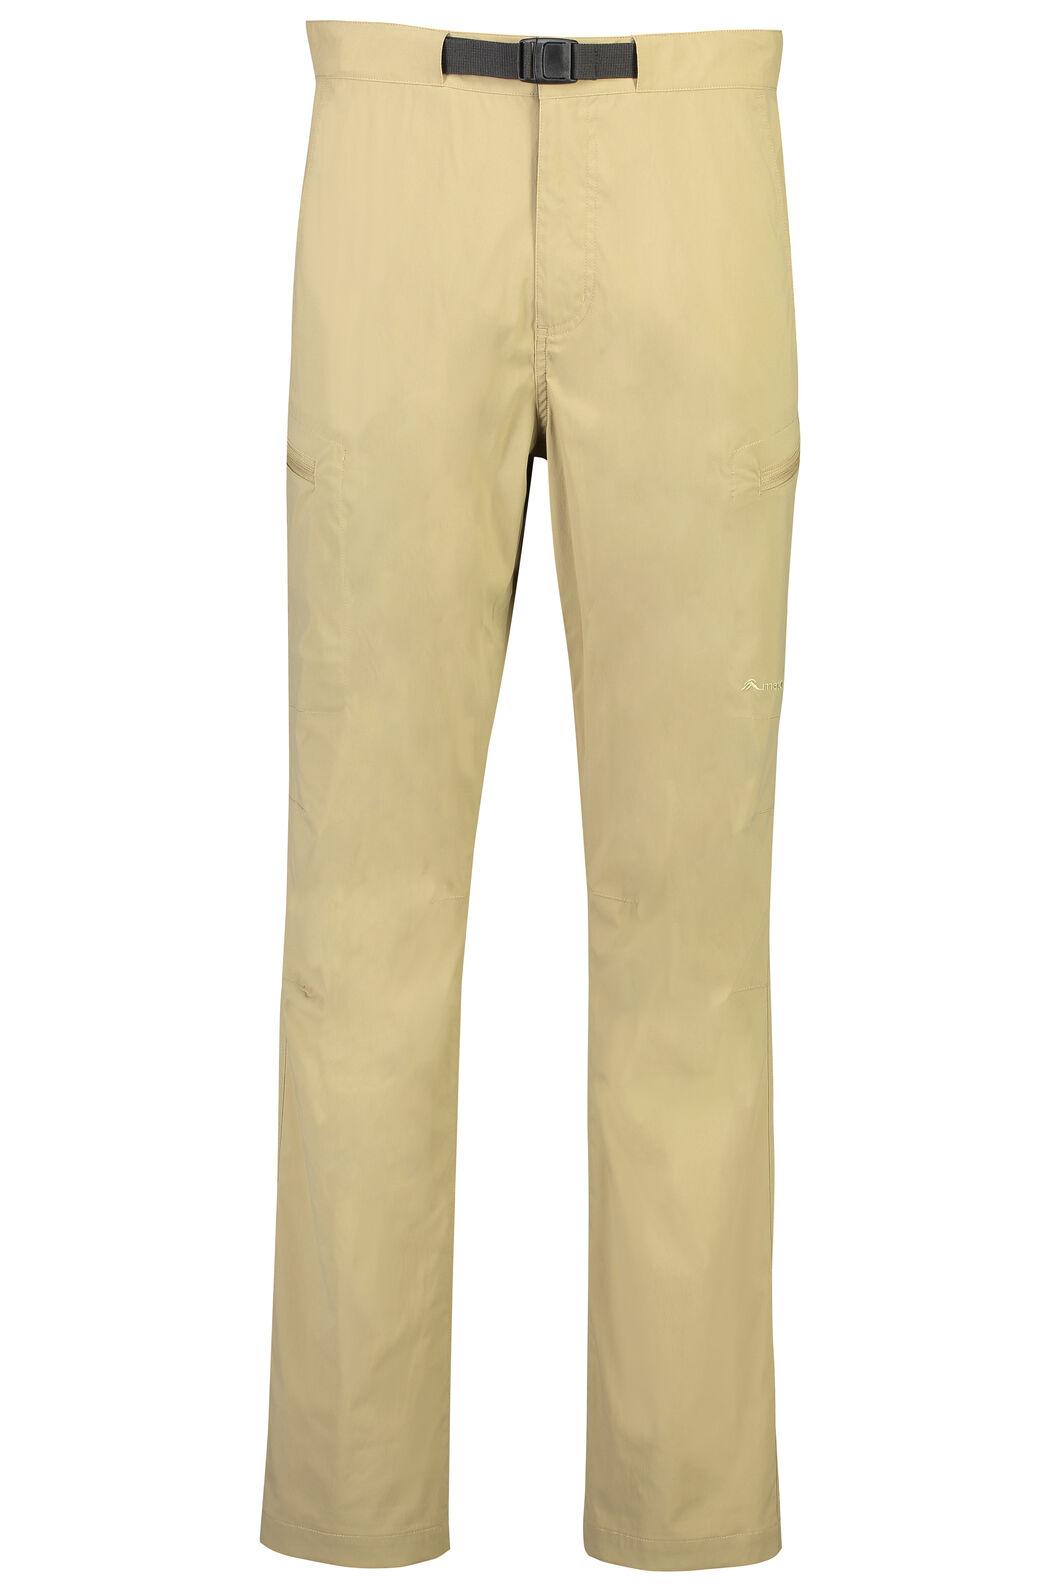 Macpac Drift Pants - Men's, Lead Grey, hi-res